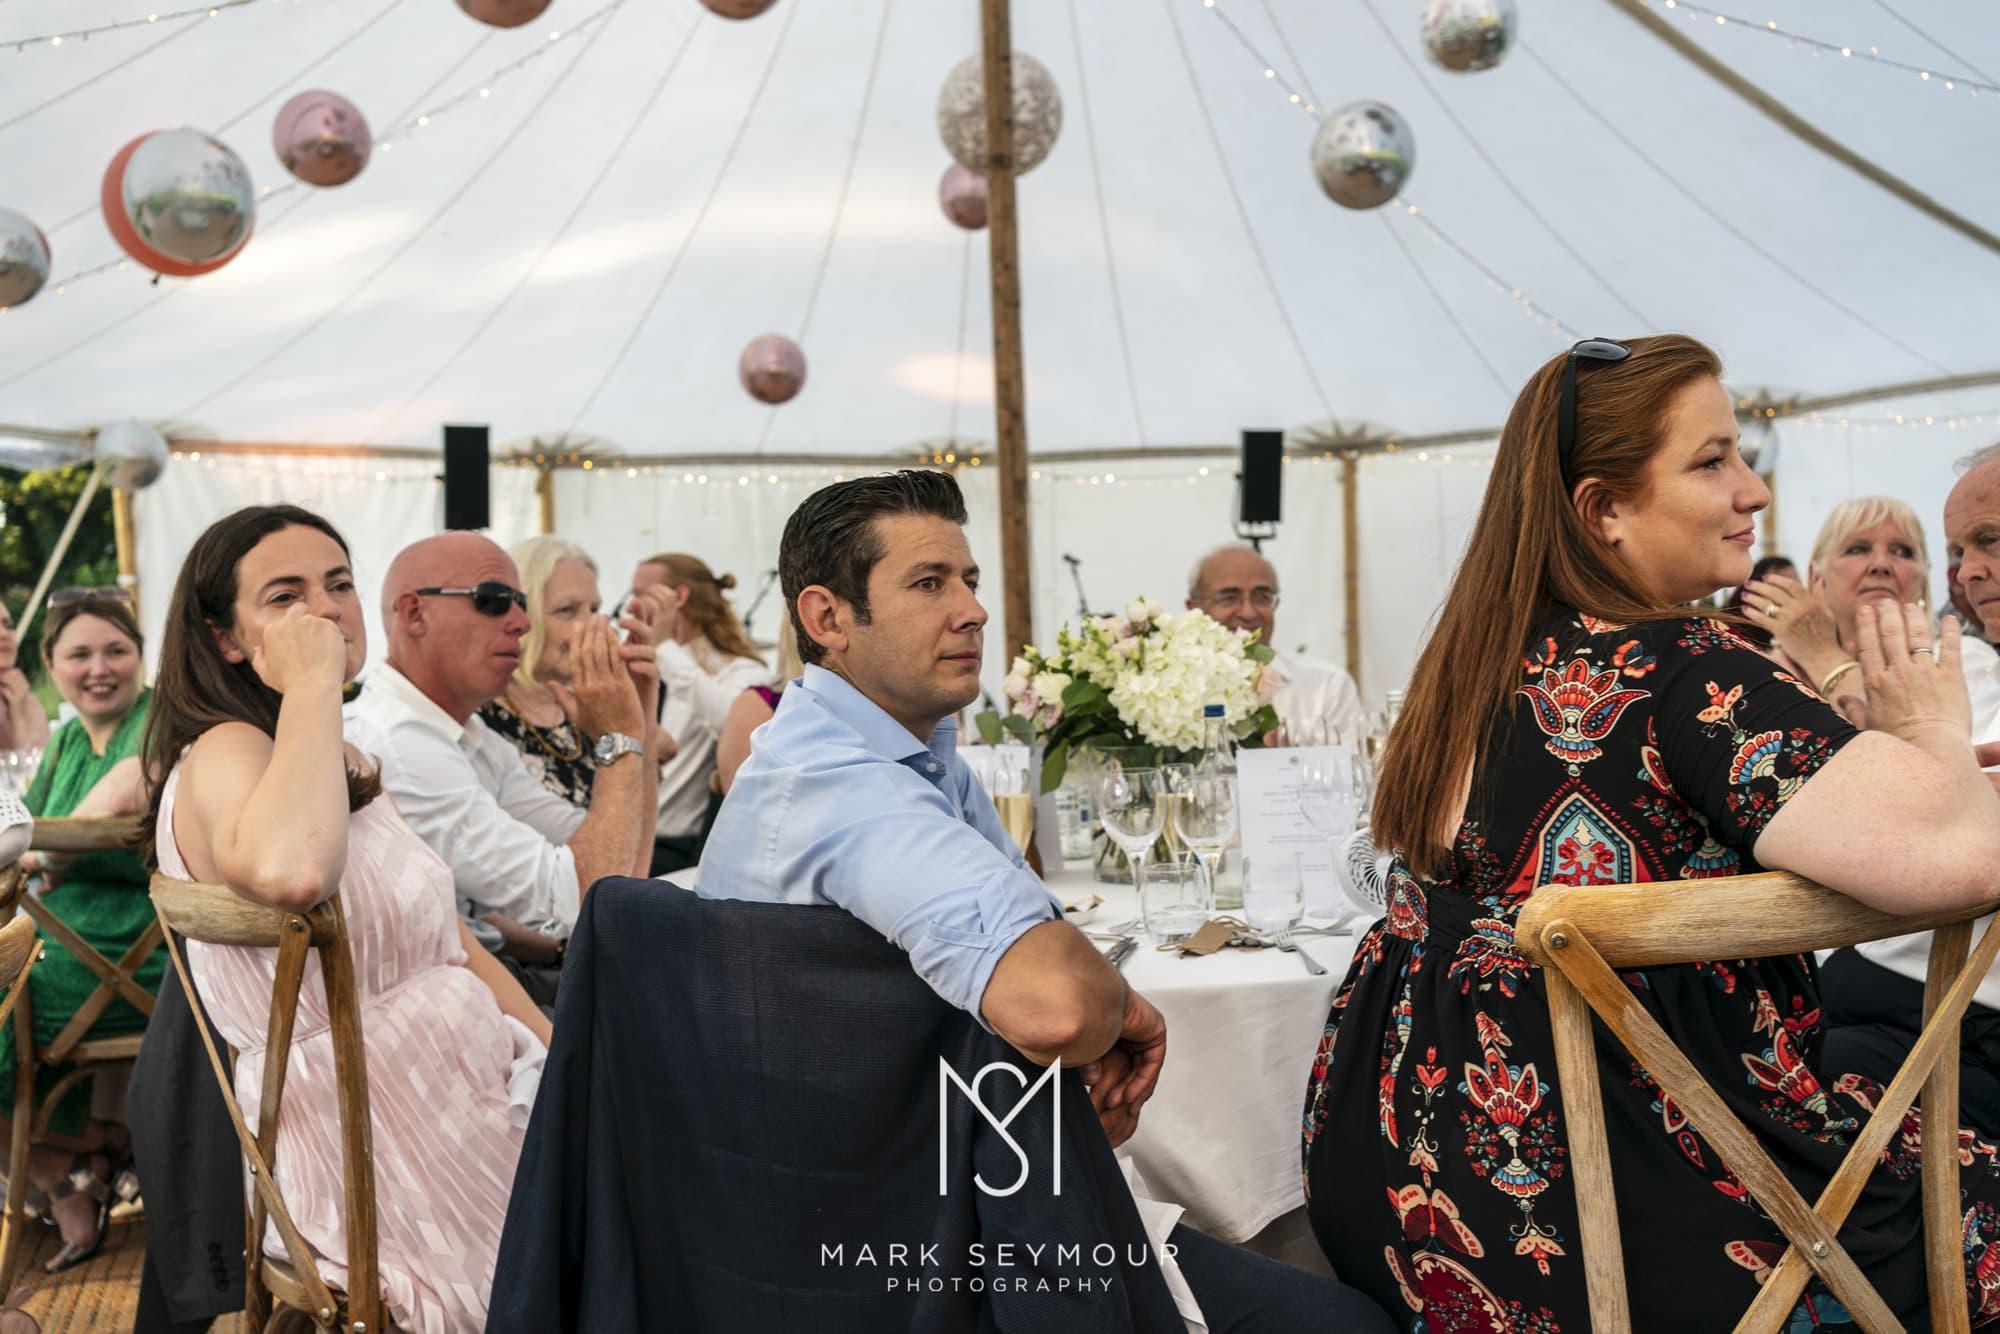 Barnsley House Wedding Photographer - Olivia and James' wedding 26